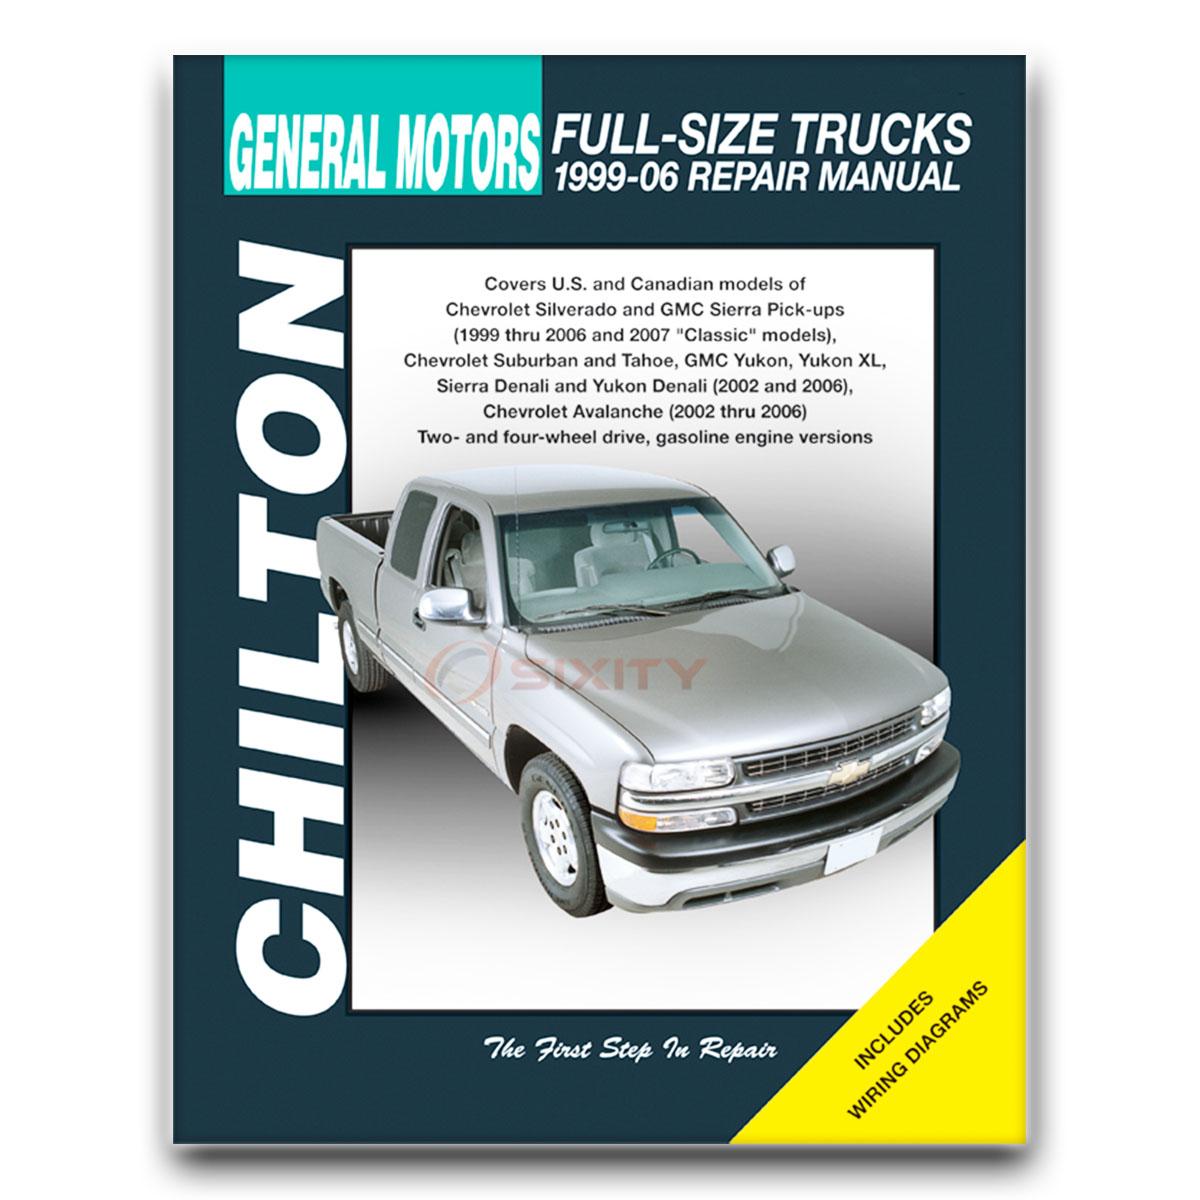 chevy suburban 1500 z71 ls rh ebay com owners manual for 2004 chevy suburban owners manual for 2008 chevy suburban